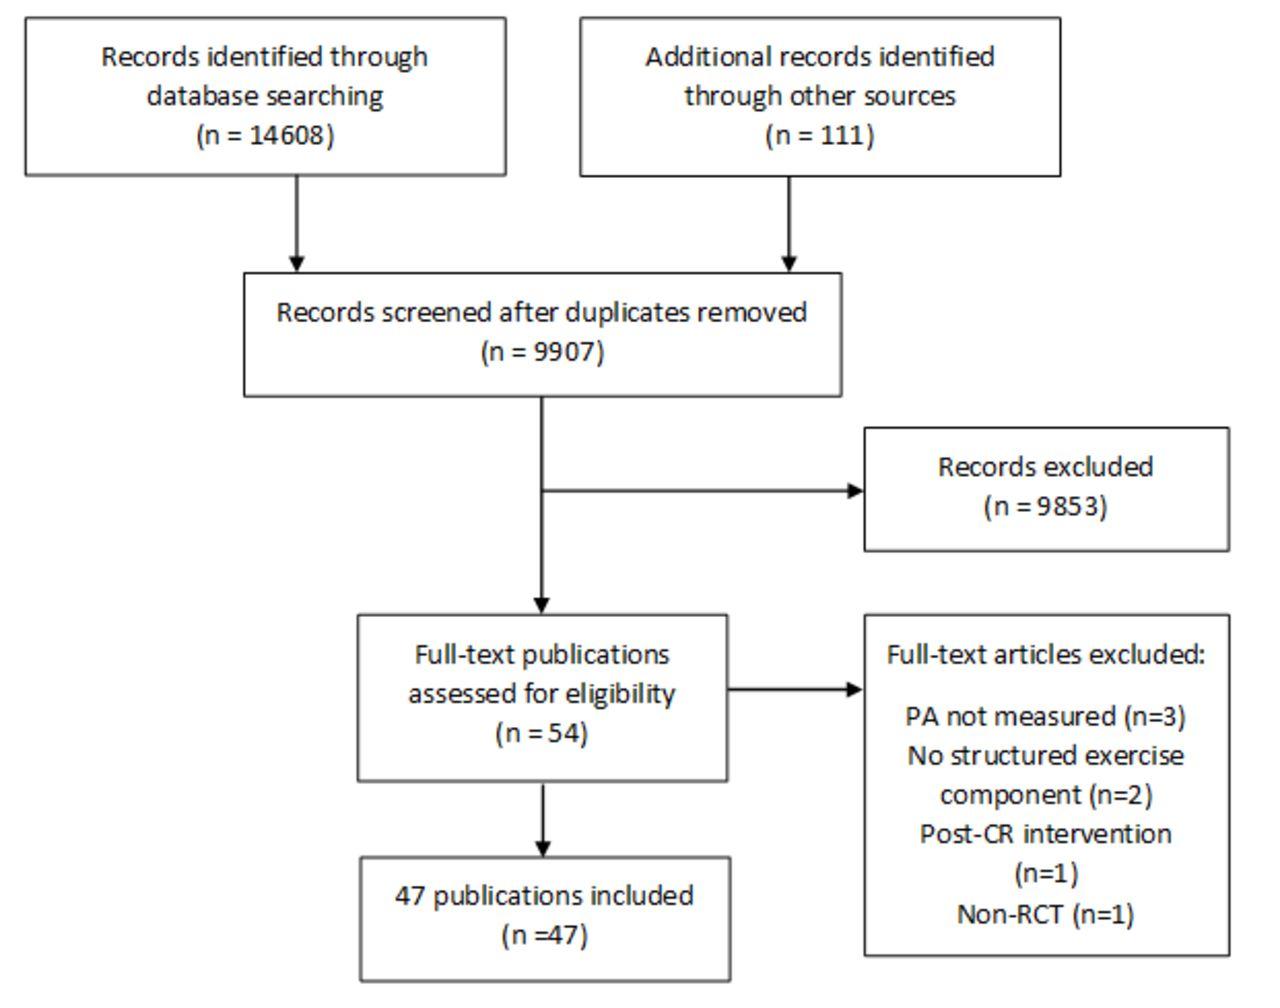 Cardiac rehabilitation and physical activity: systematic